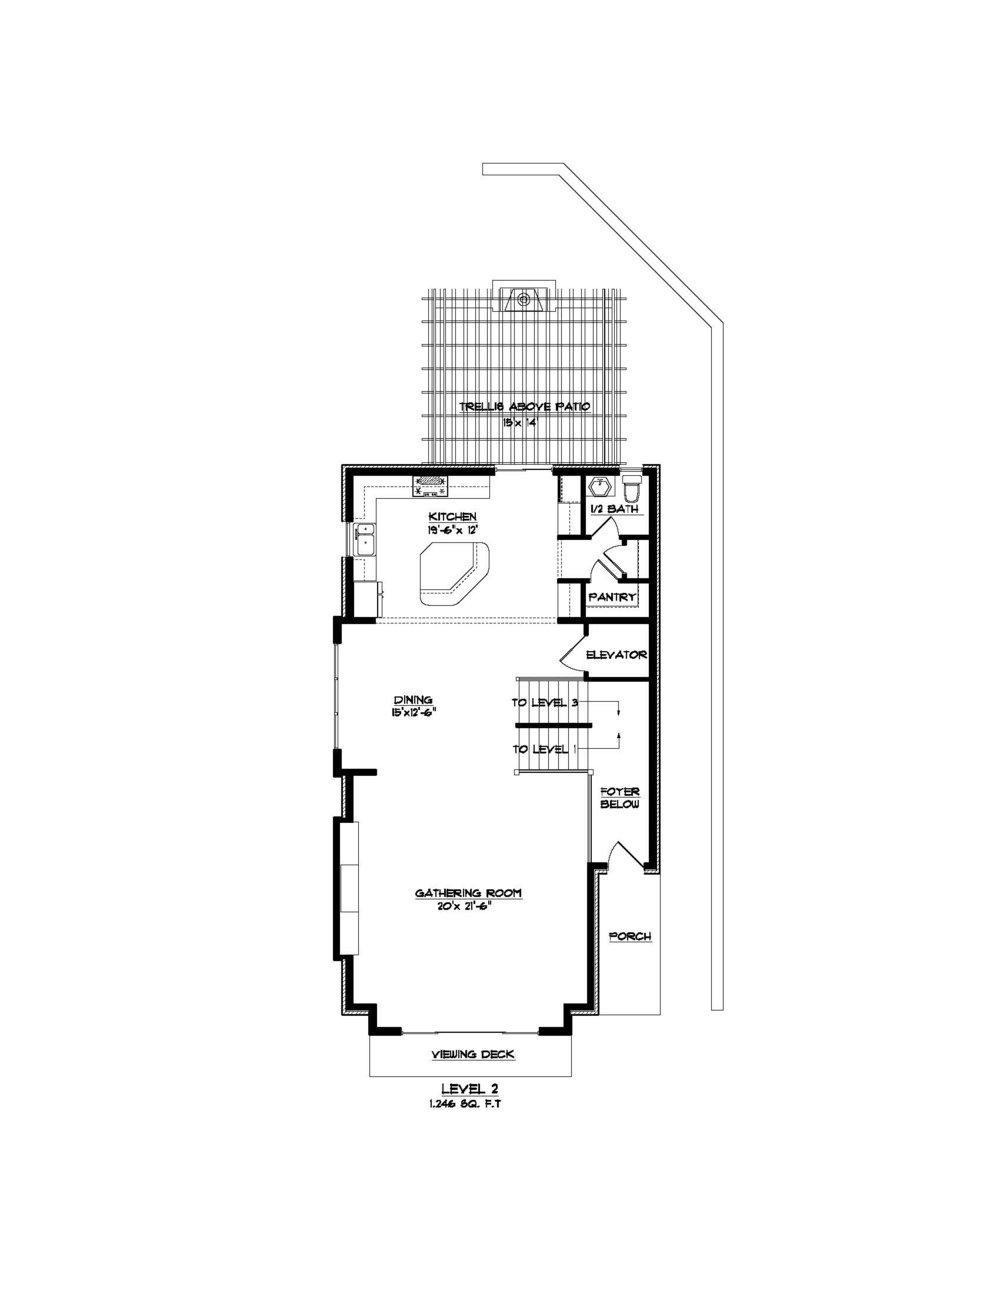 Dayton floor level 2.jpg